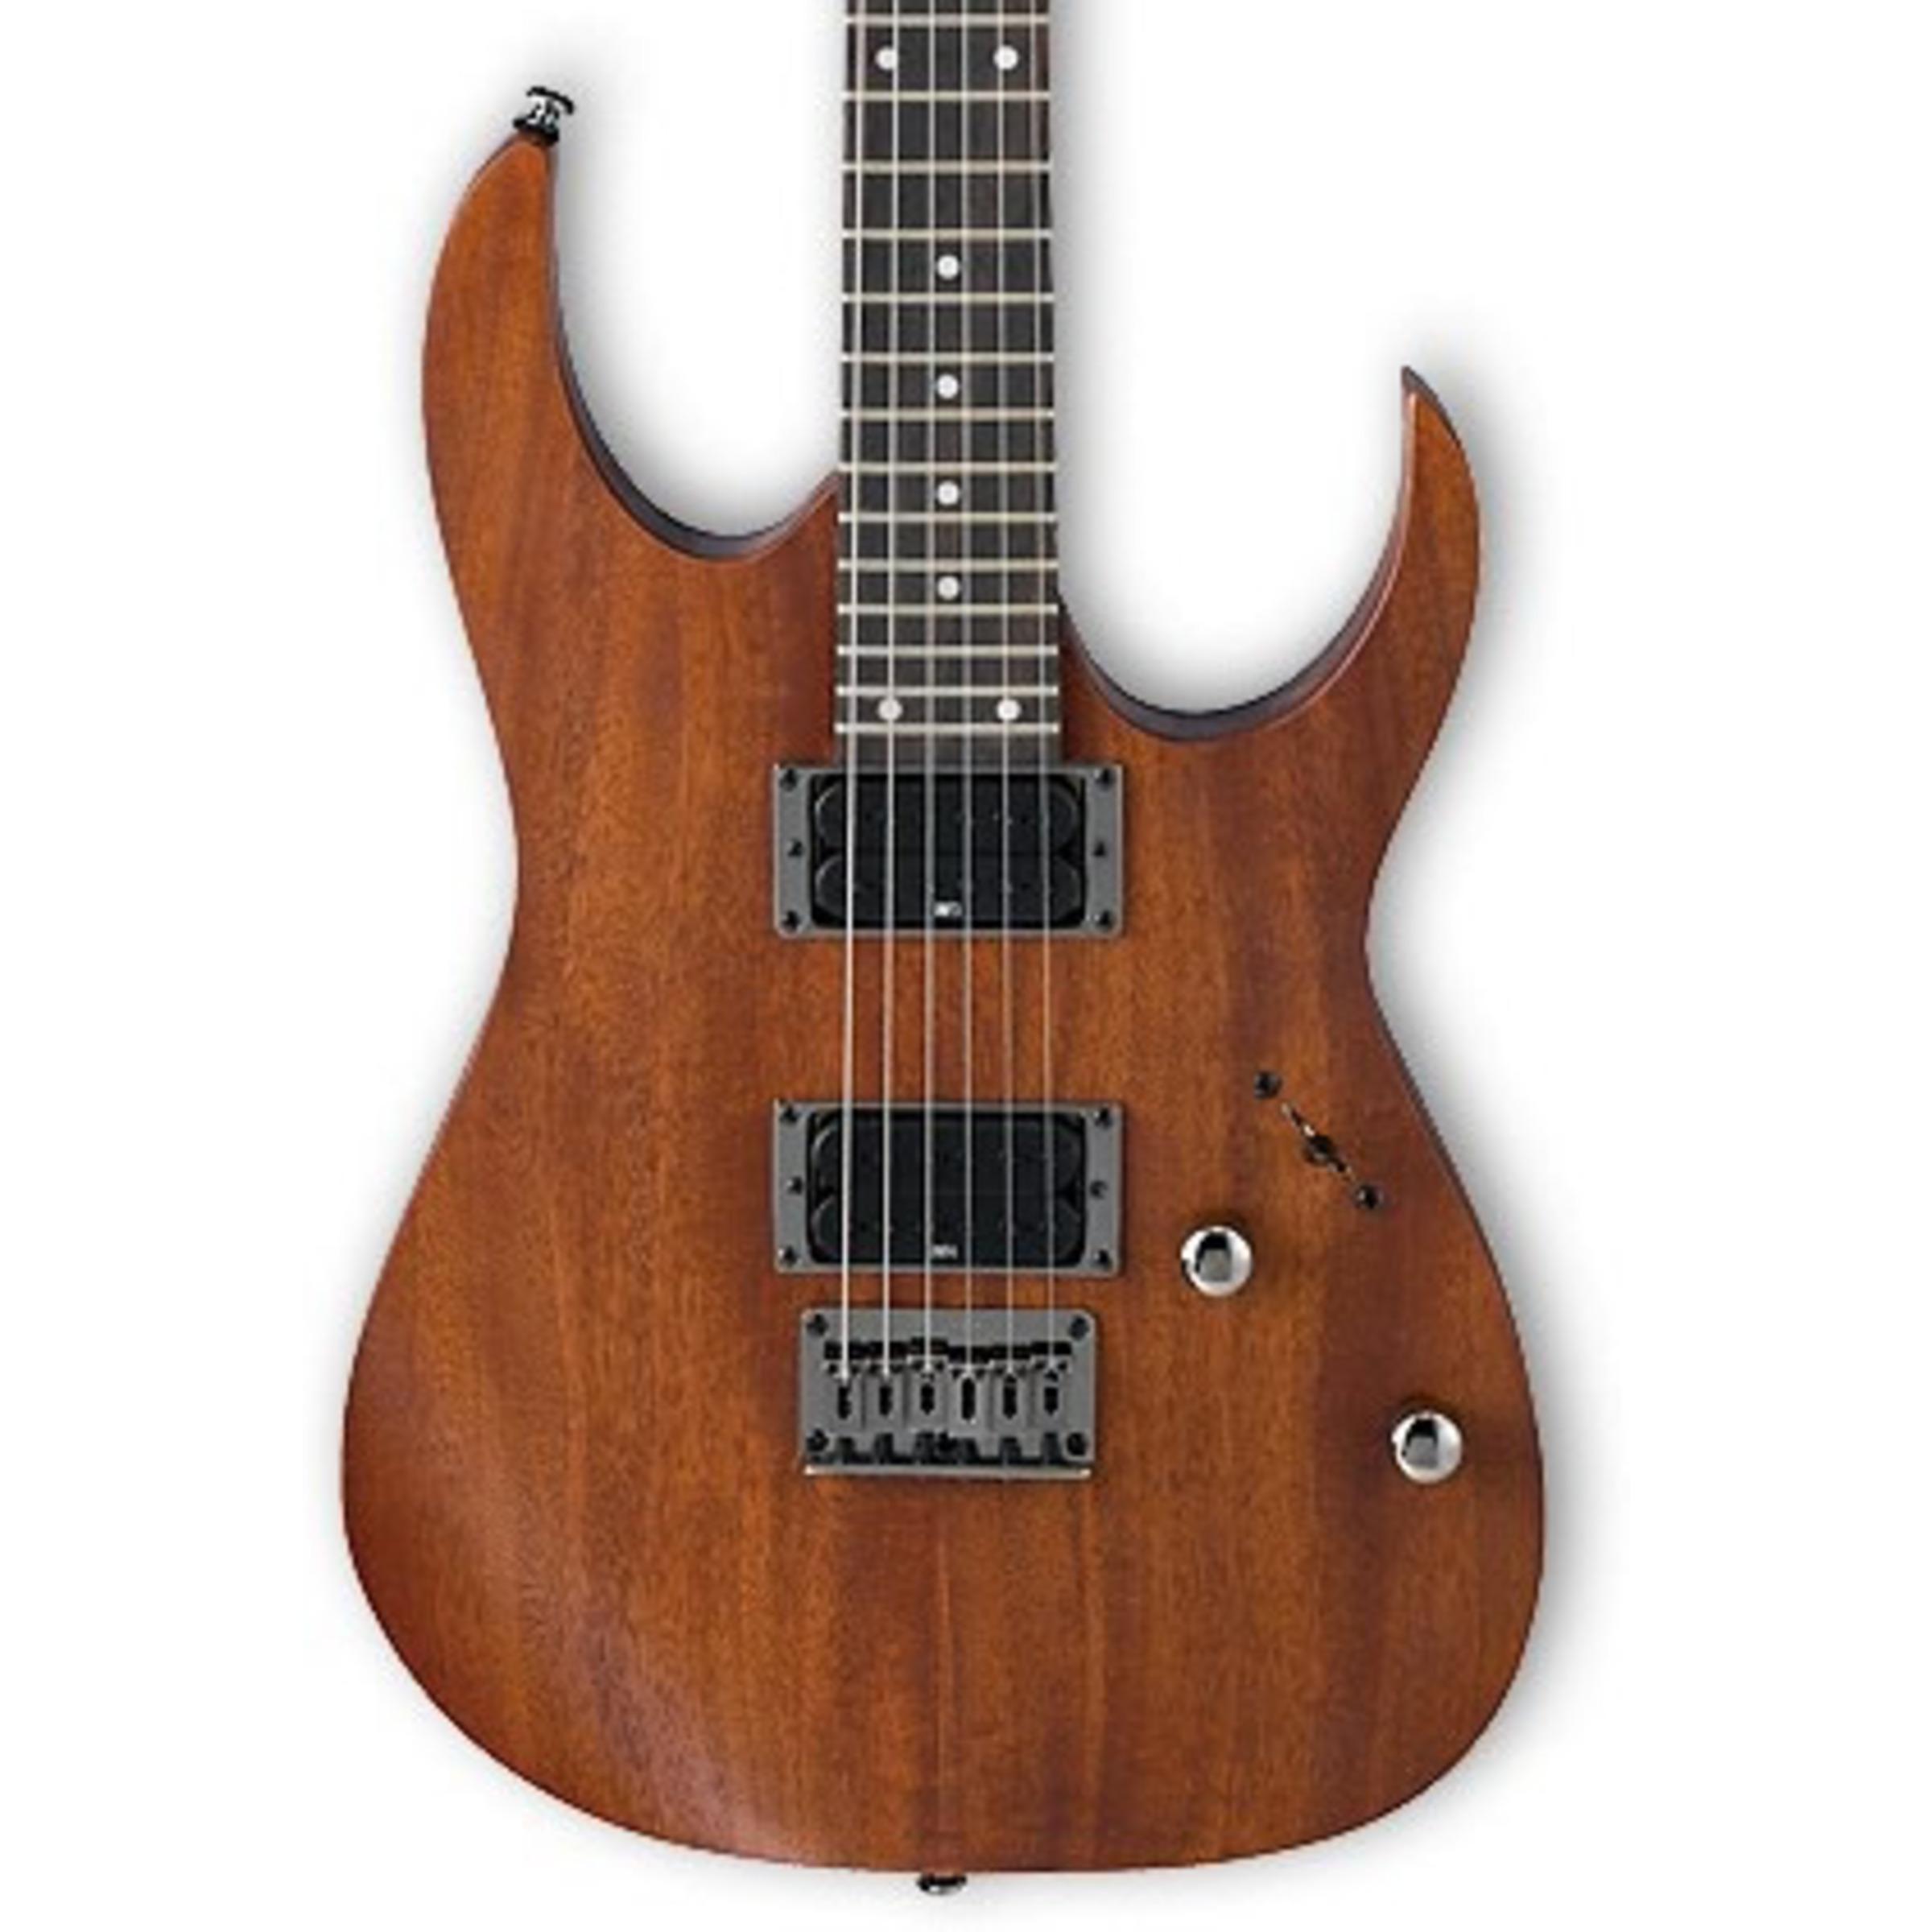 Buy Electric Guitar Online Uk : ibanez rg421 electric guitar mahogany oil giggear ~ Vivirlamusica.com Haus und Dekorationen